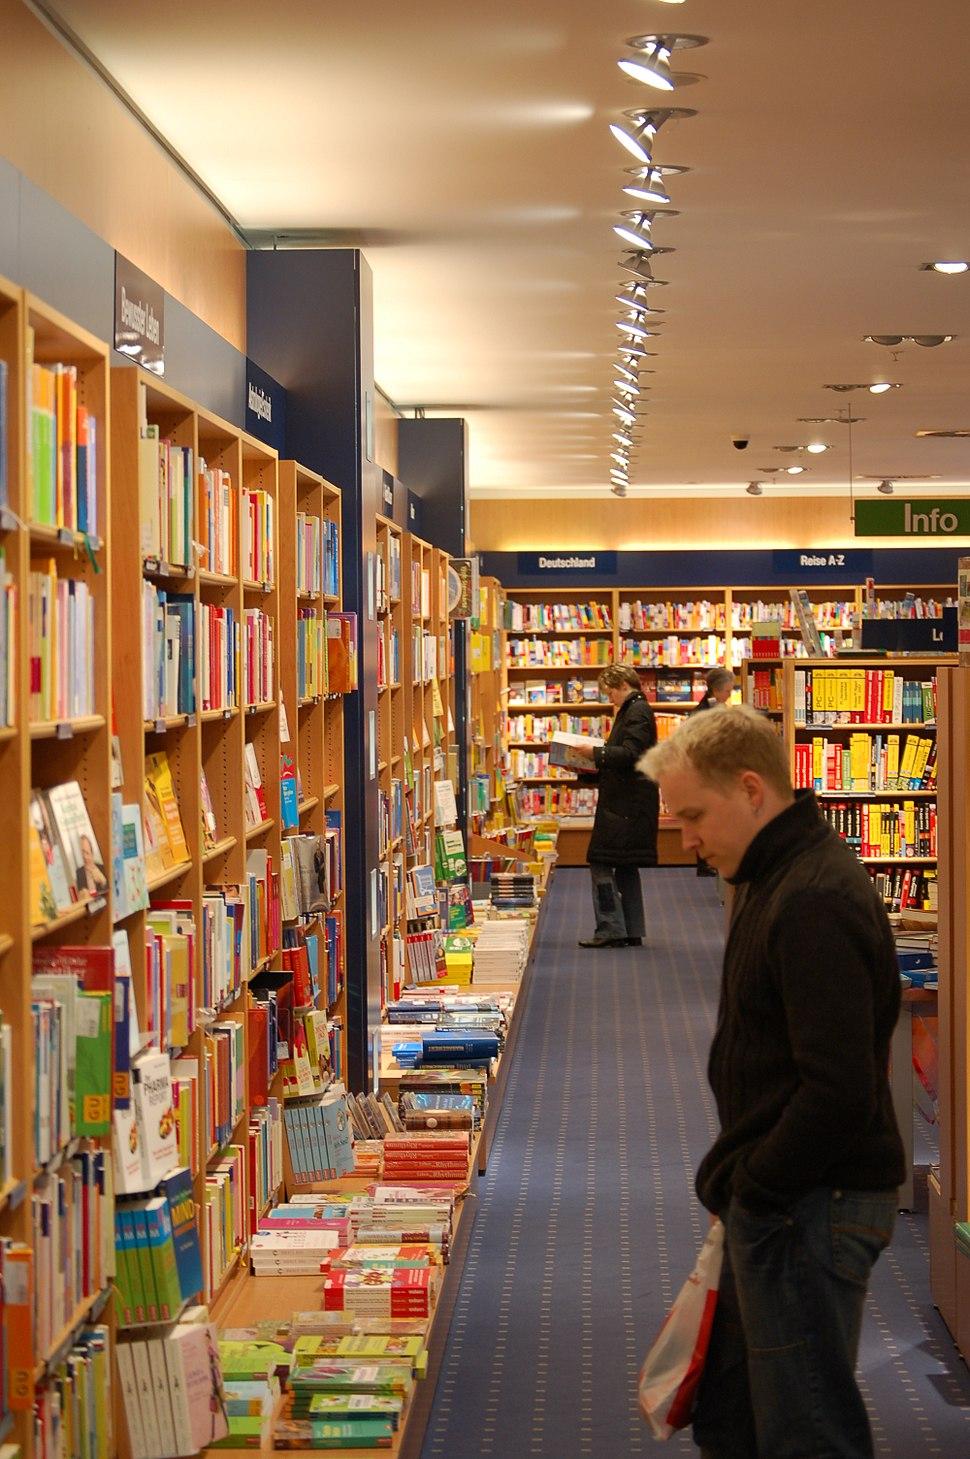 Buchladen buecher